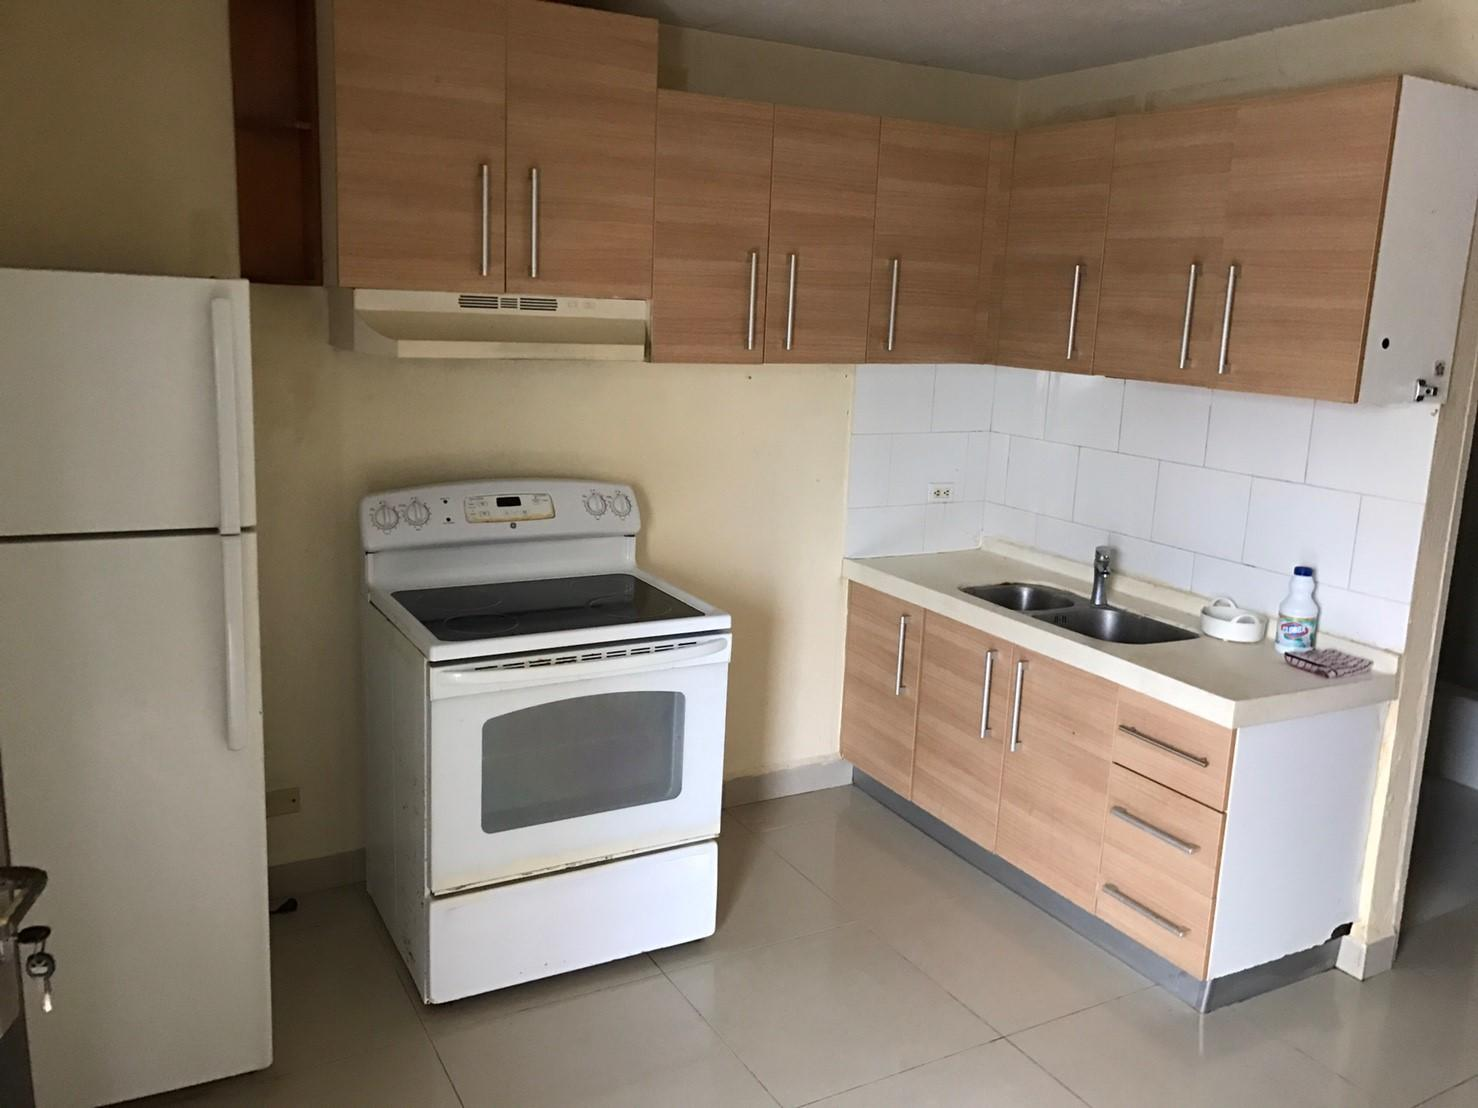 Perez (Yang Apartment) Lane #13, MongMong-Toto-Maite, GU 96910